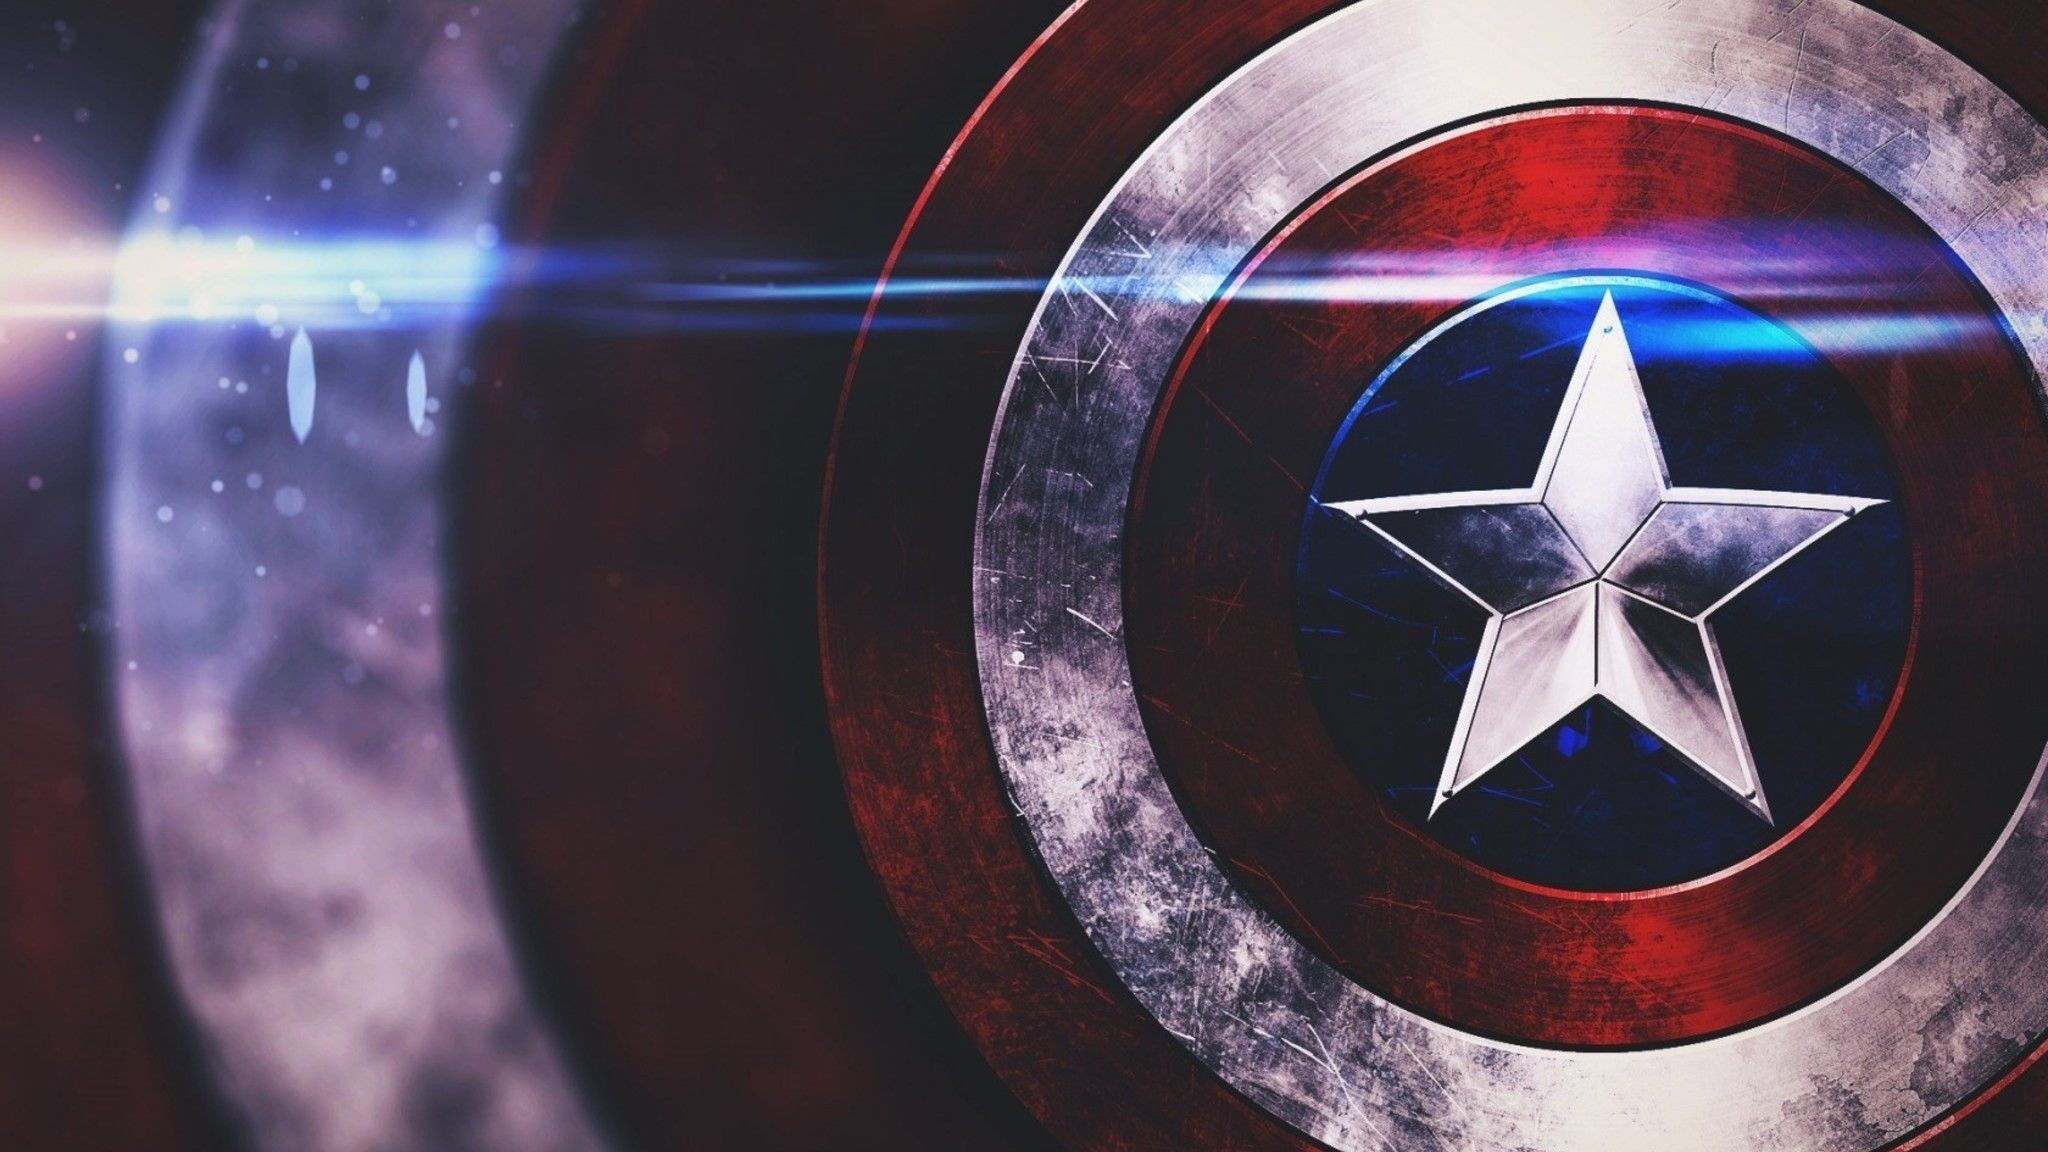 Captain America Superhero Wallpaper Captain America Wallpaper Captain America Shield Wallpaper Avengers Wallpaper